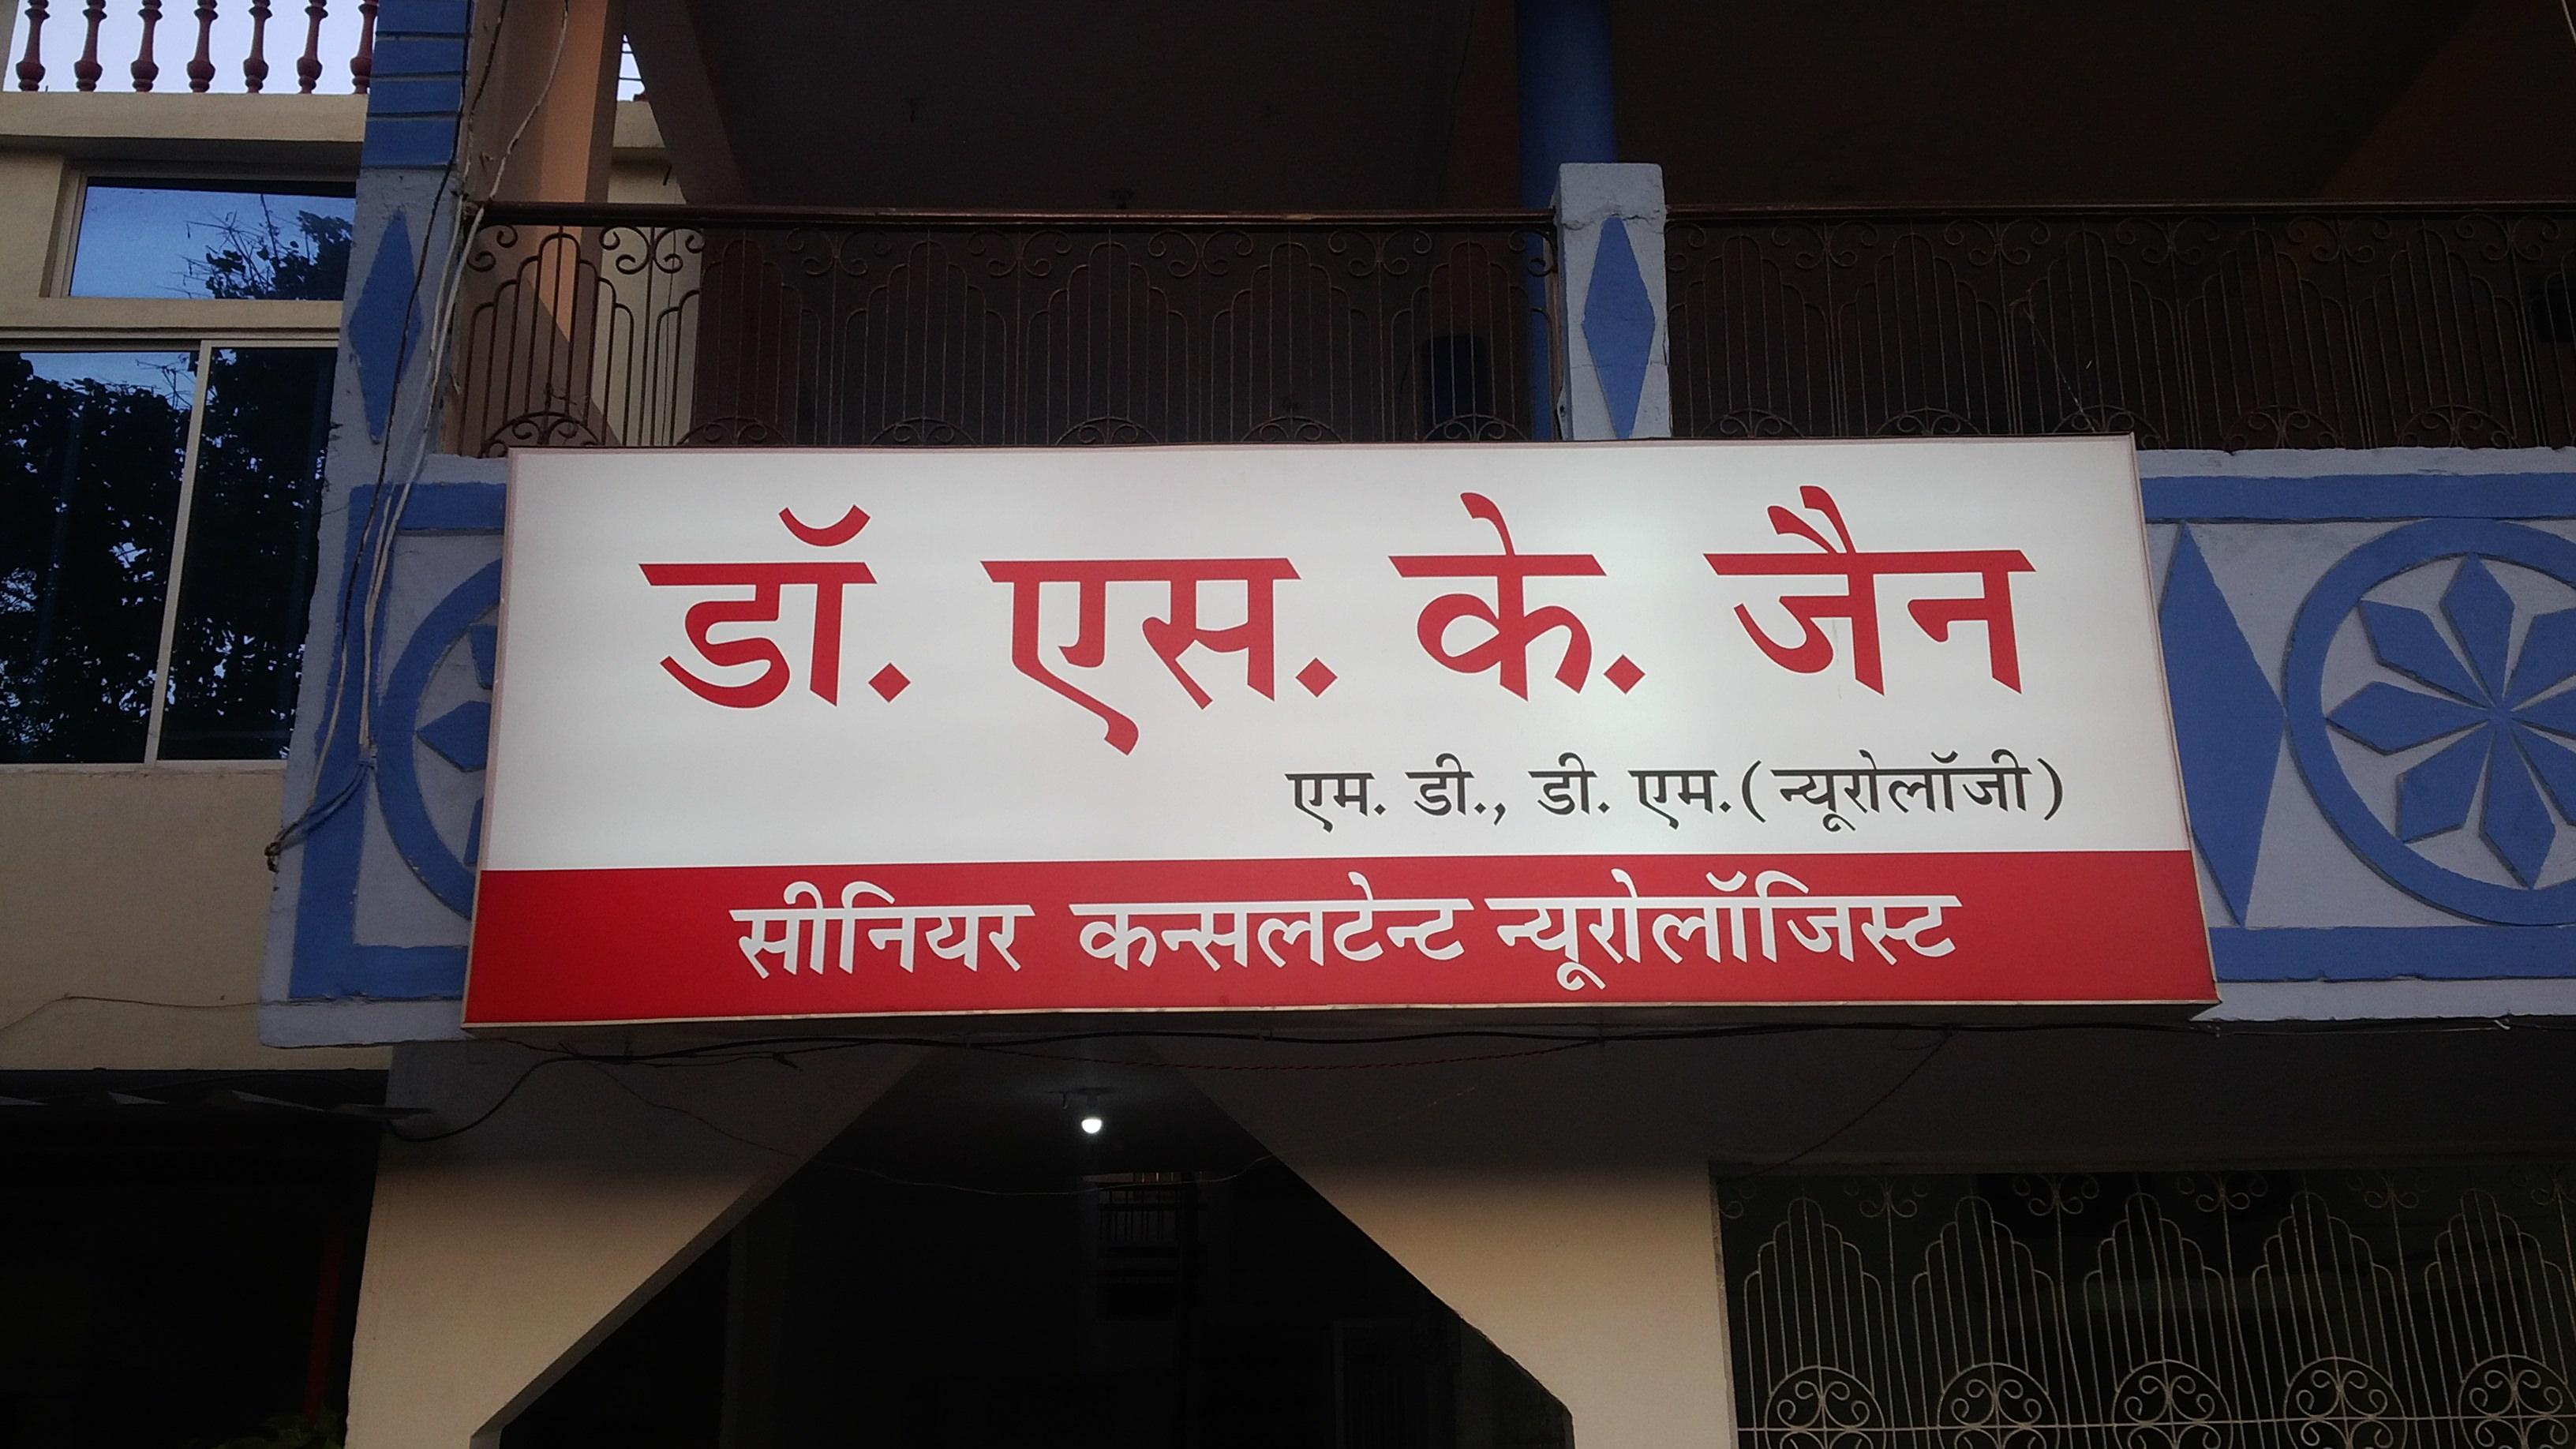 Dr.S.K.Jain Clinic